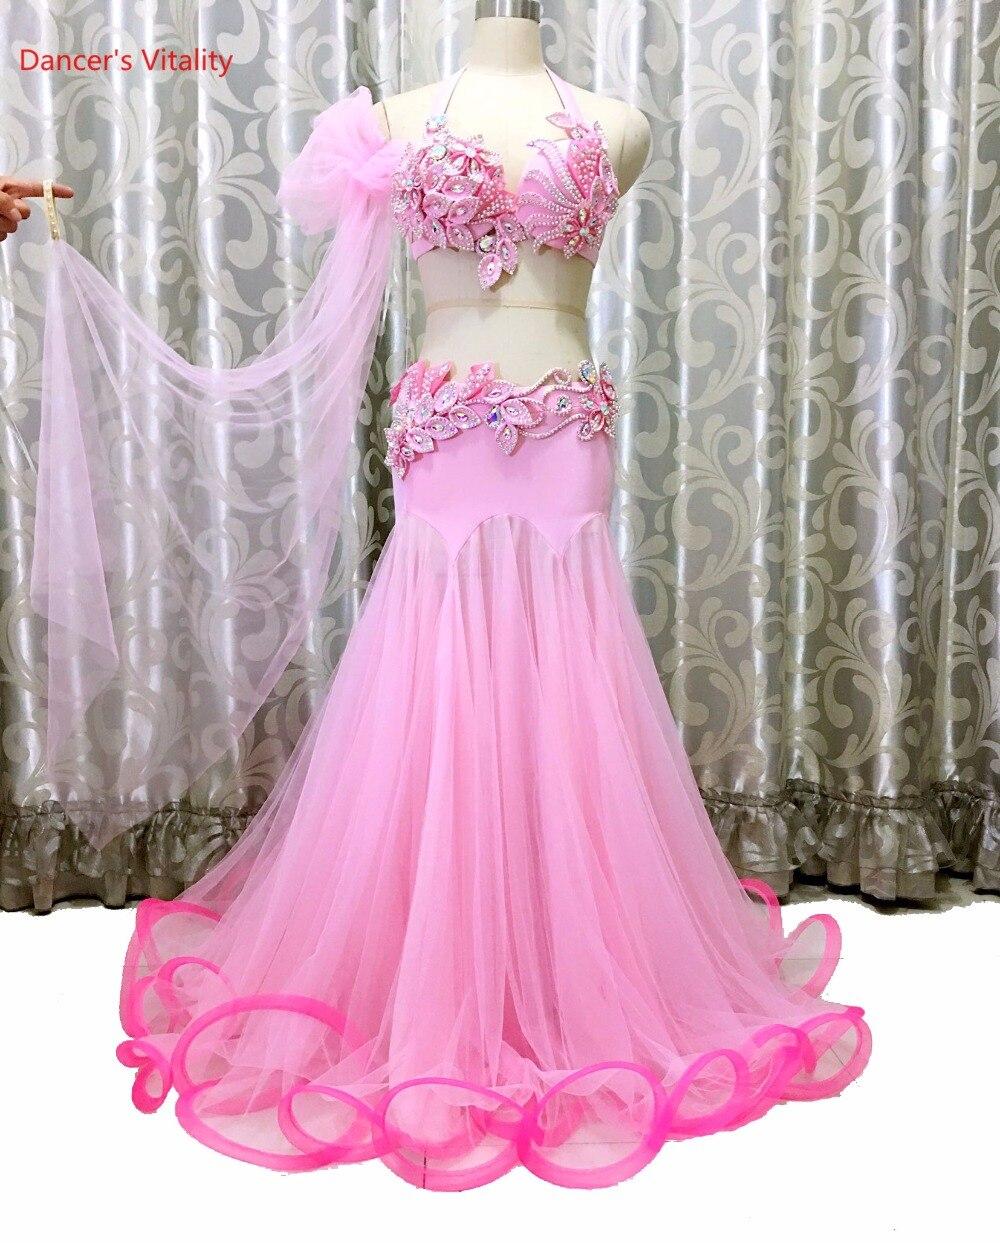 Dancer's Vitality Belly Dance Costumes Diamond Embroidery Bra Shoulder Cupcake Dress Bellydance Set For Oriental Dance Costumes